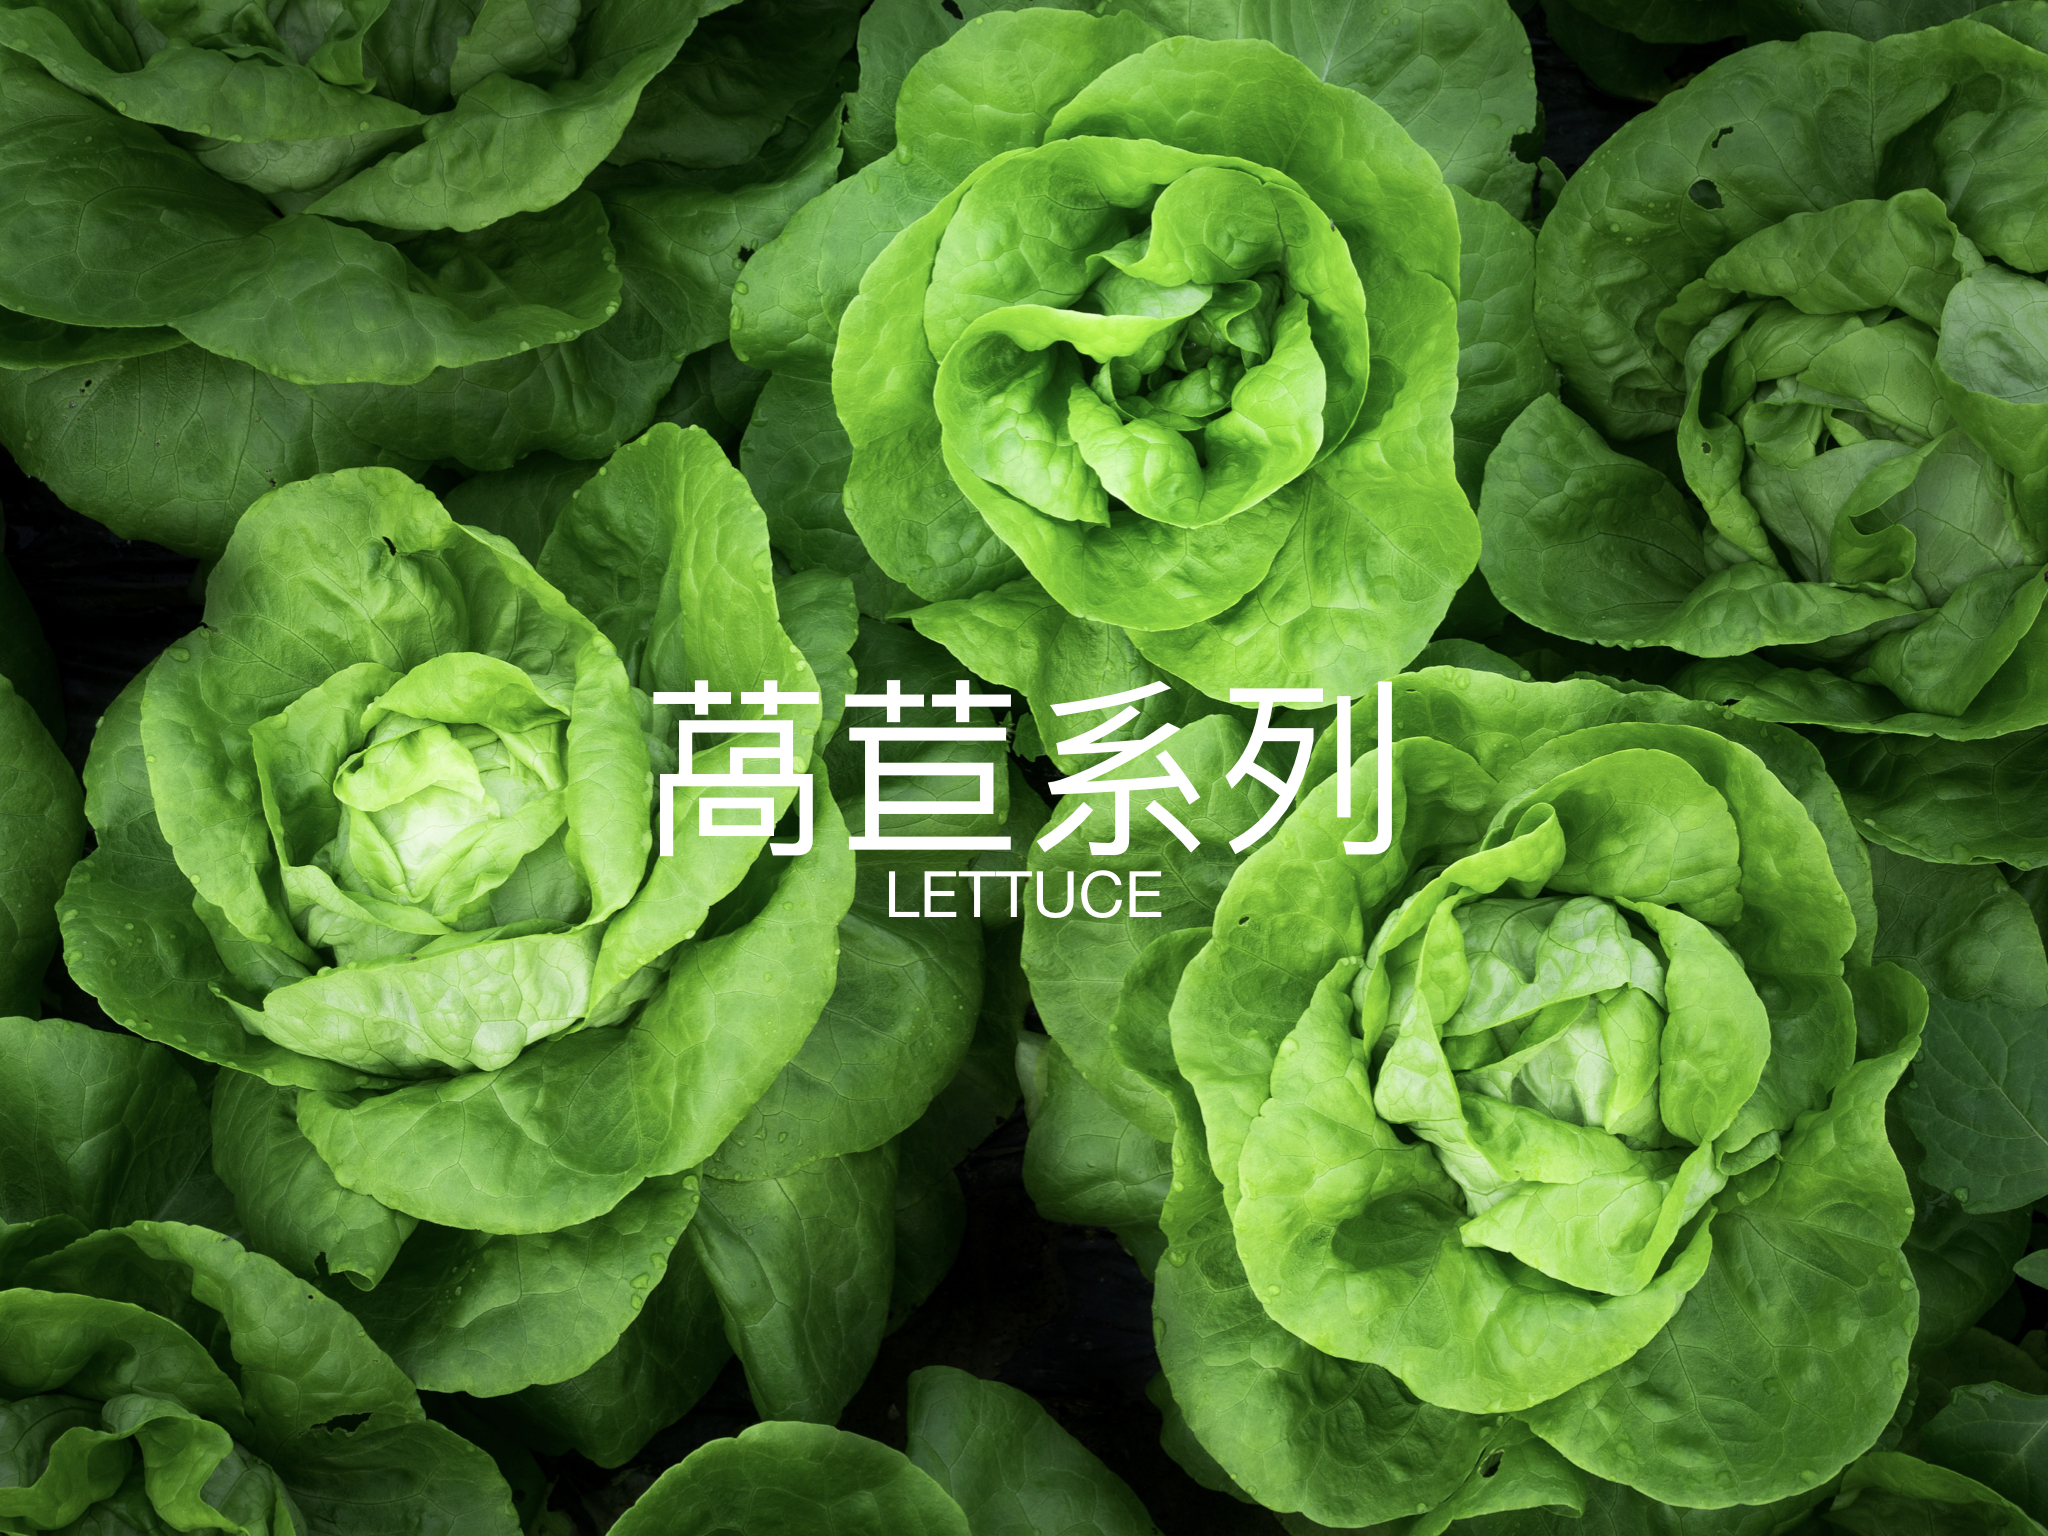 green up 蔬菜介紹 個別圖片.001.jpeg